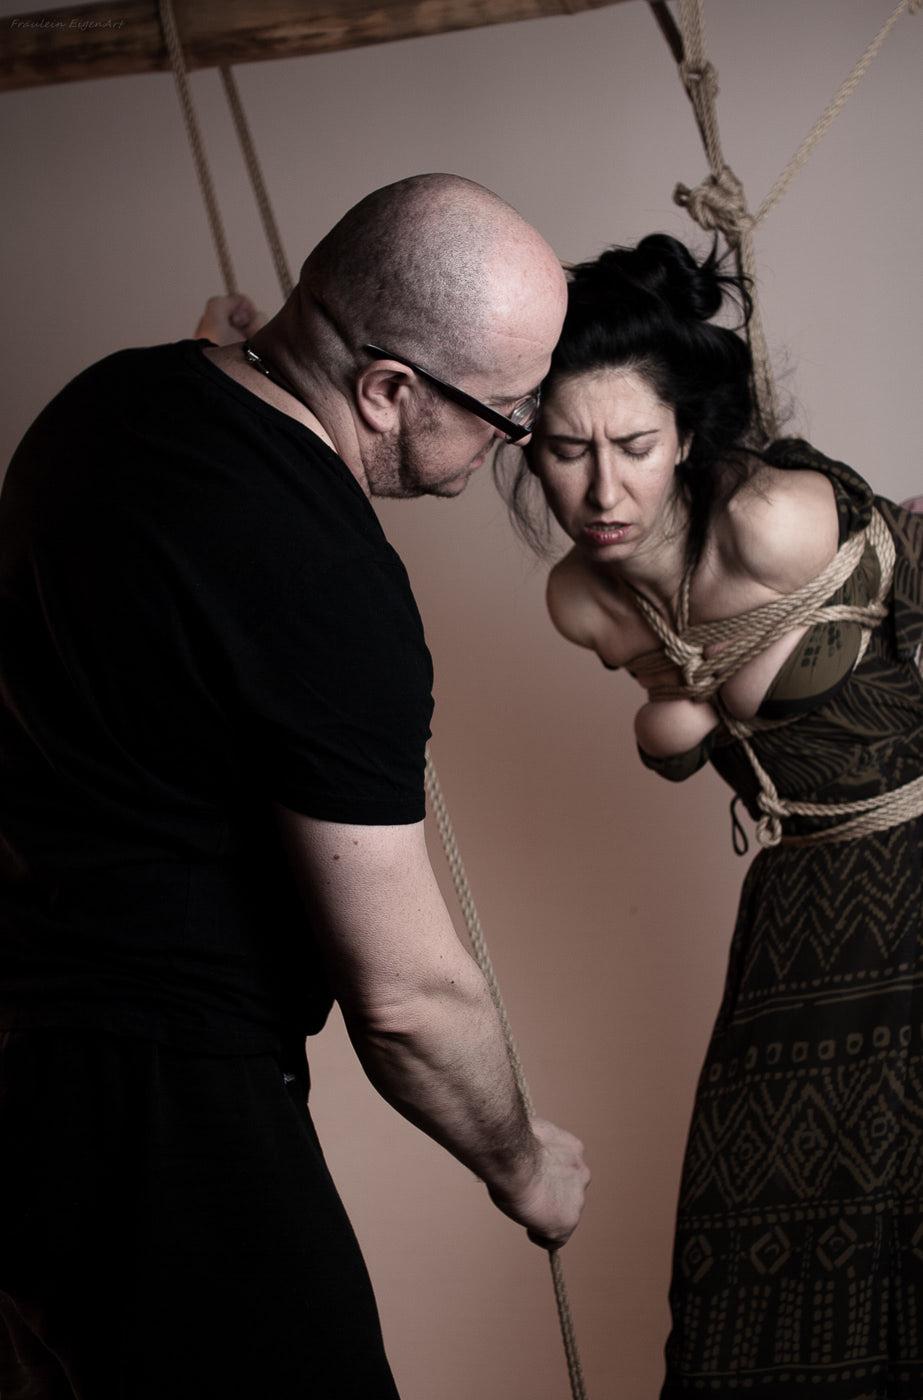 Kinbaku Photography Passion Couple Intimacy